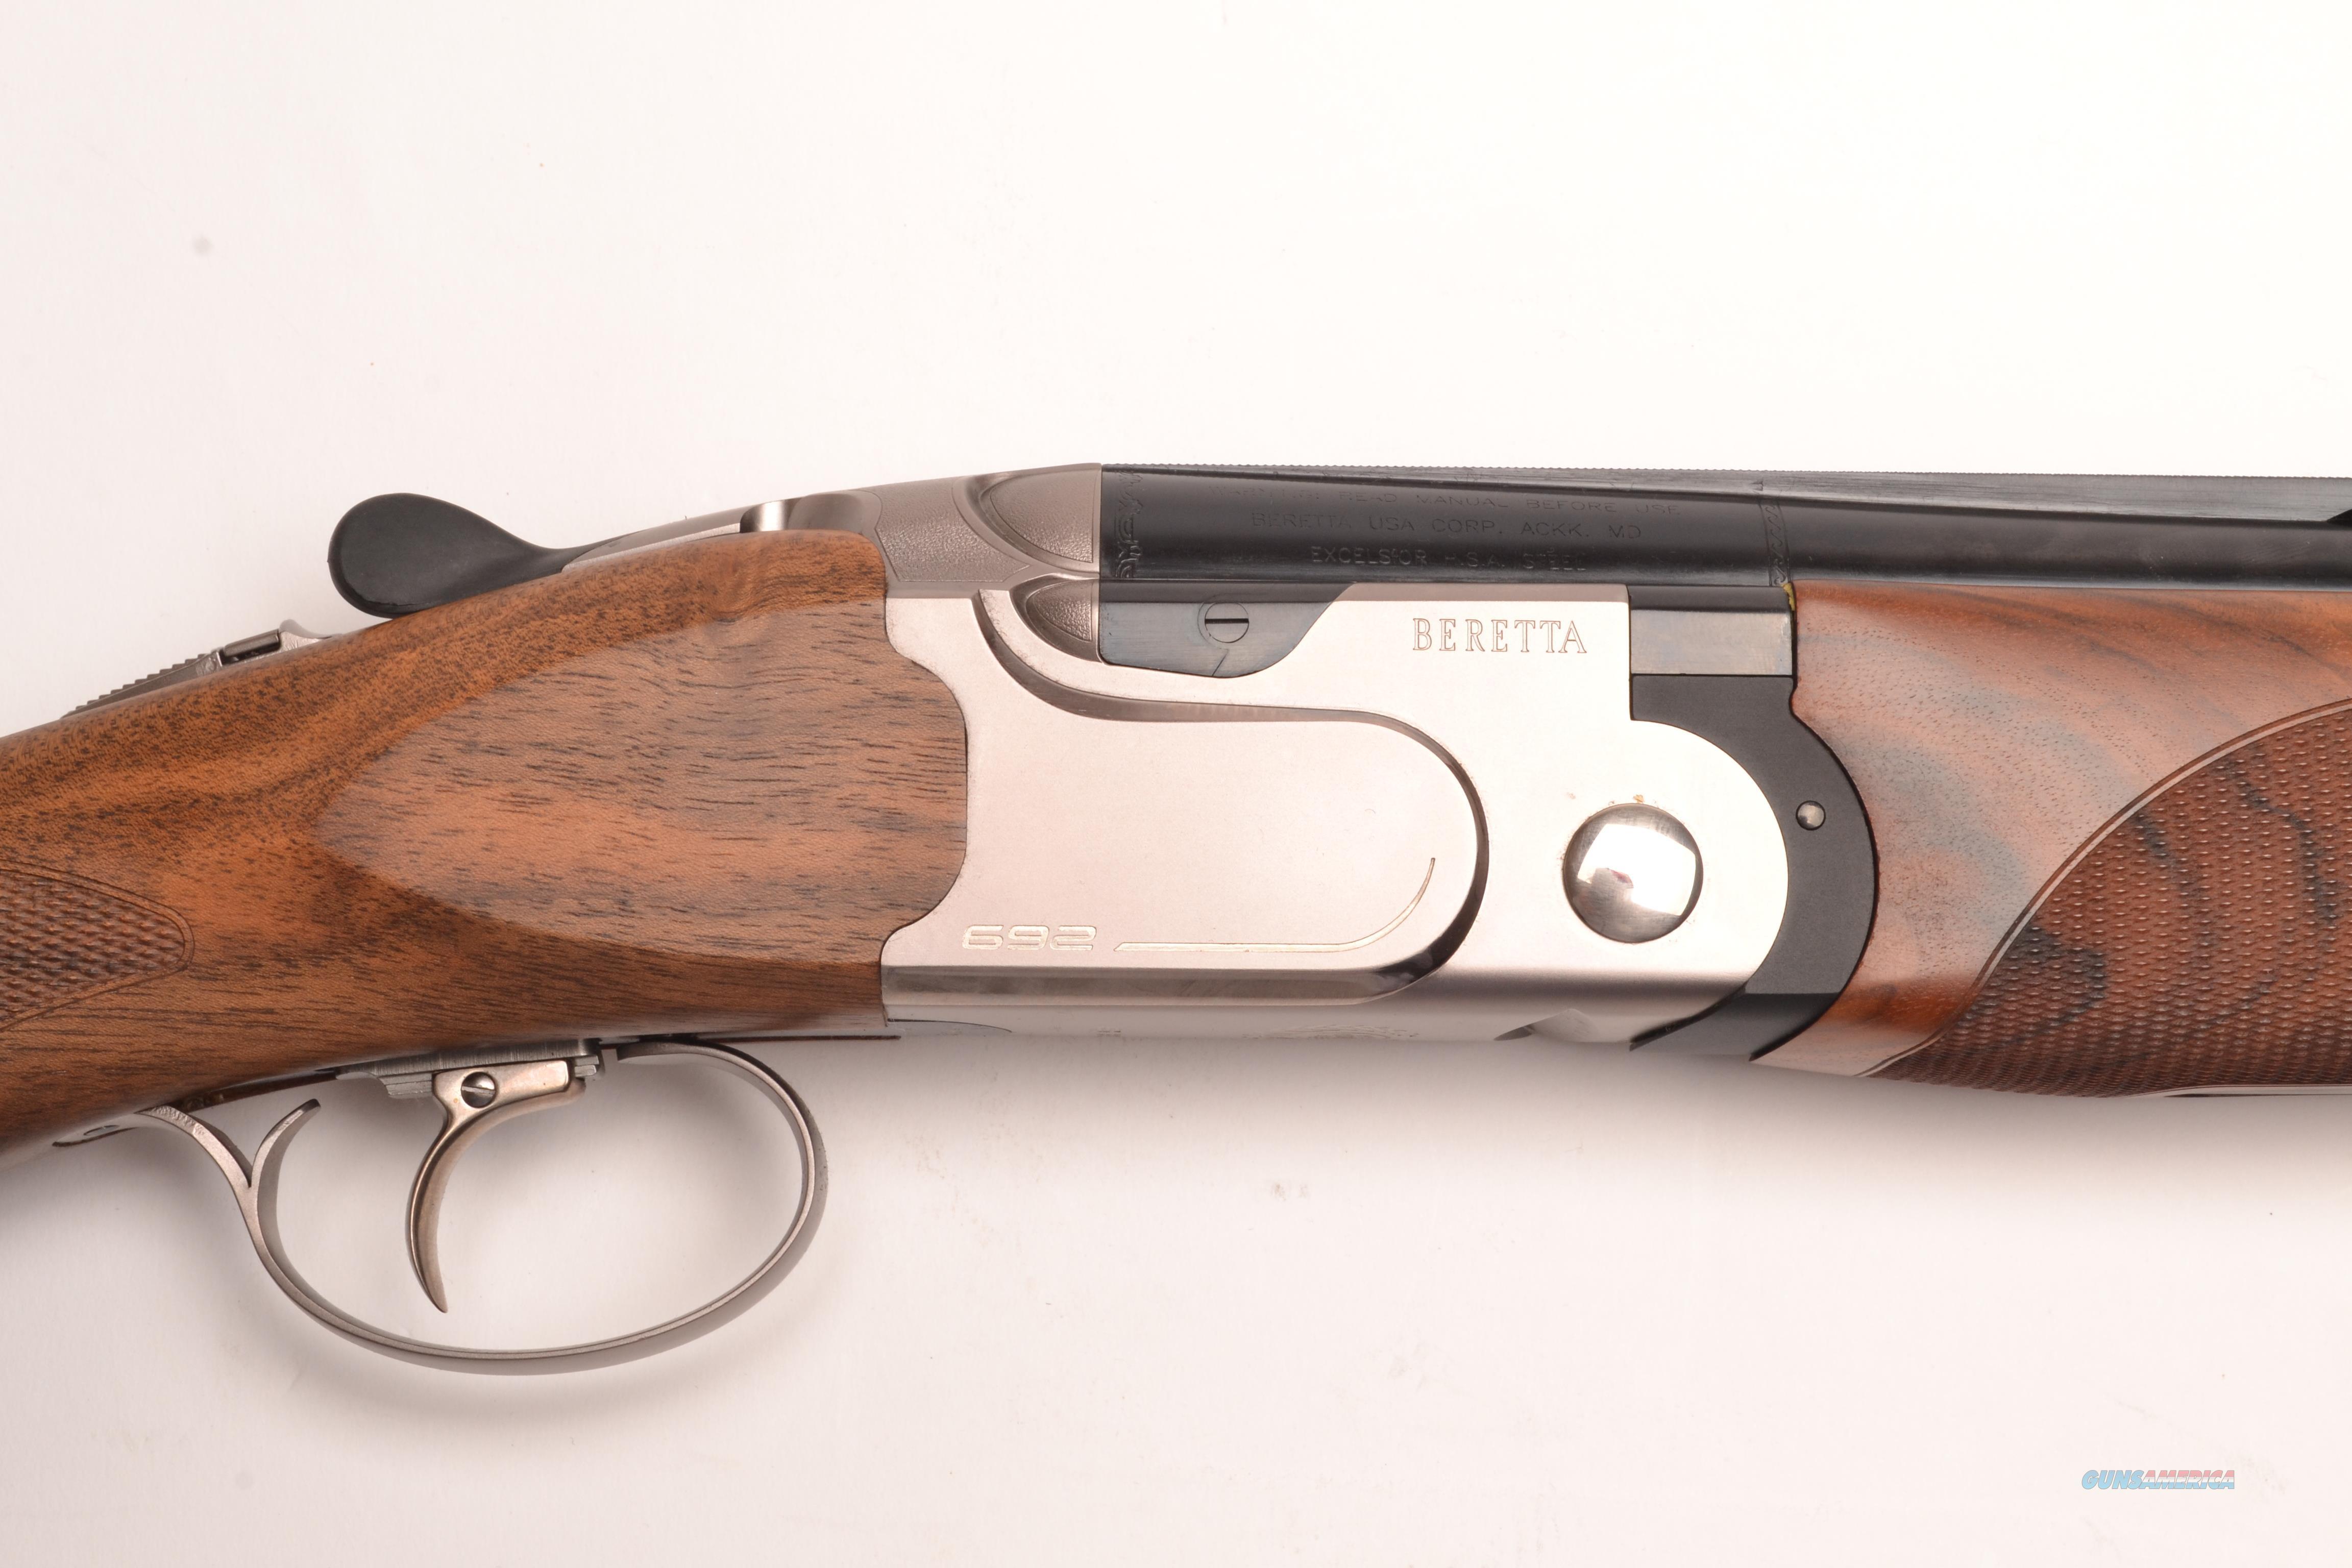 Beretta - 692 Sporting 12ga.  Guns > Shotguns > Beretta Shotguns > O/U > Hunting